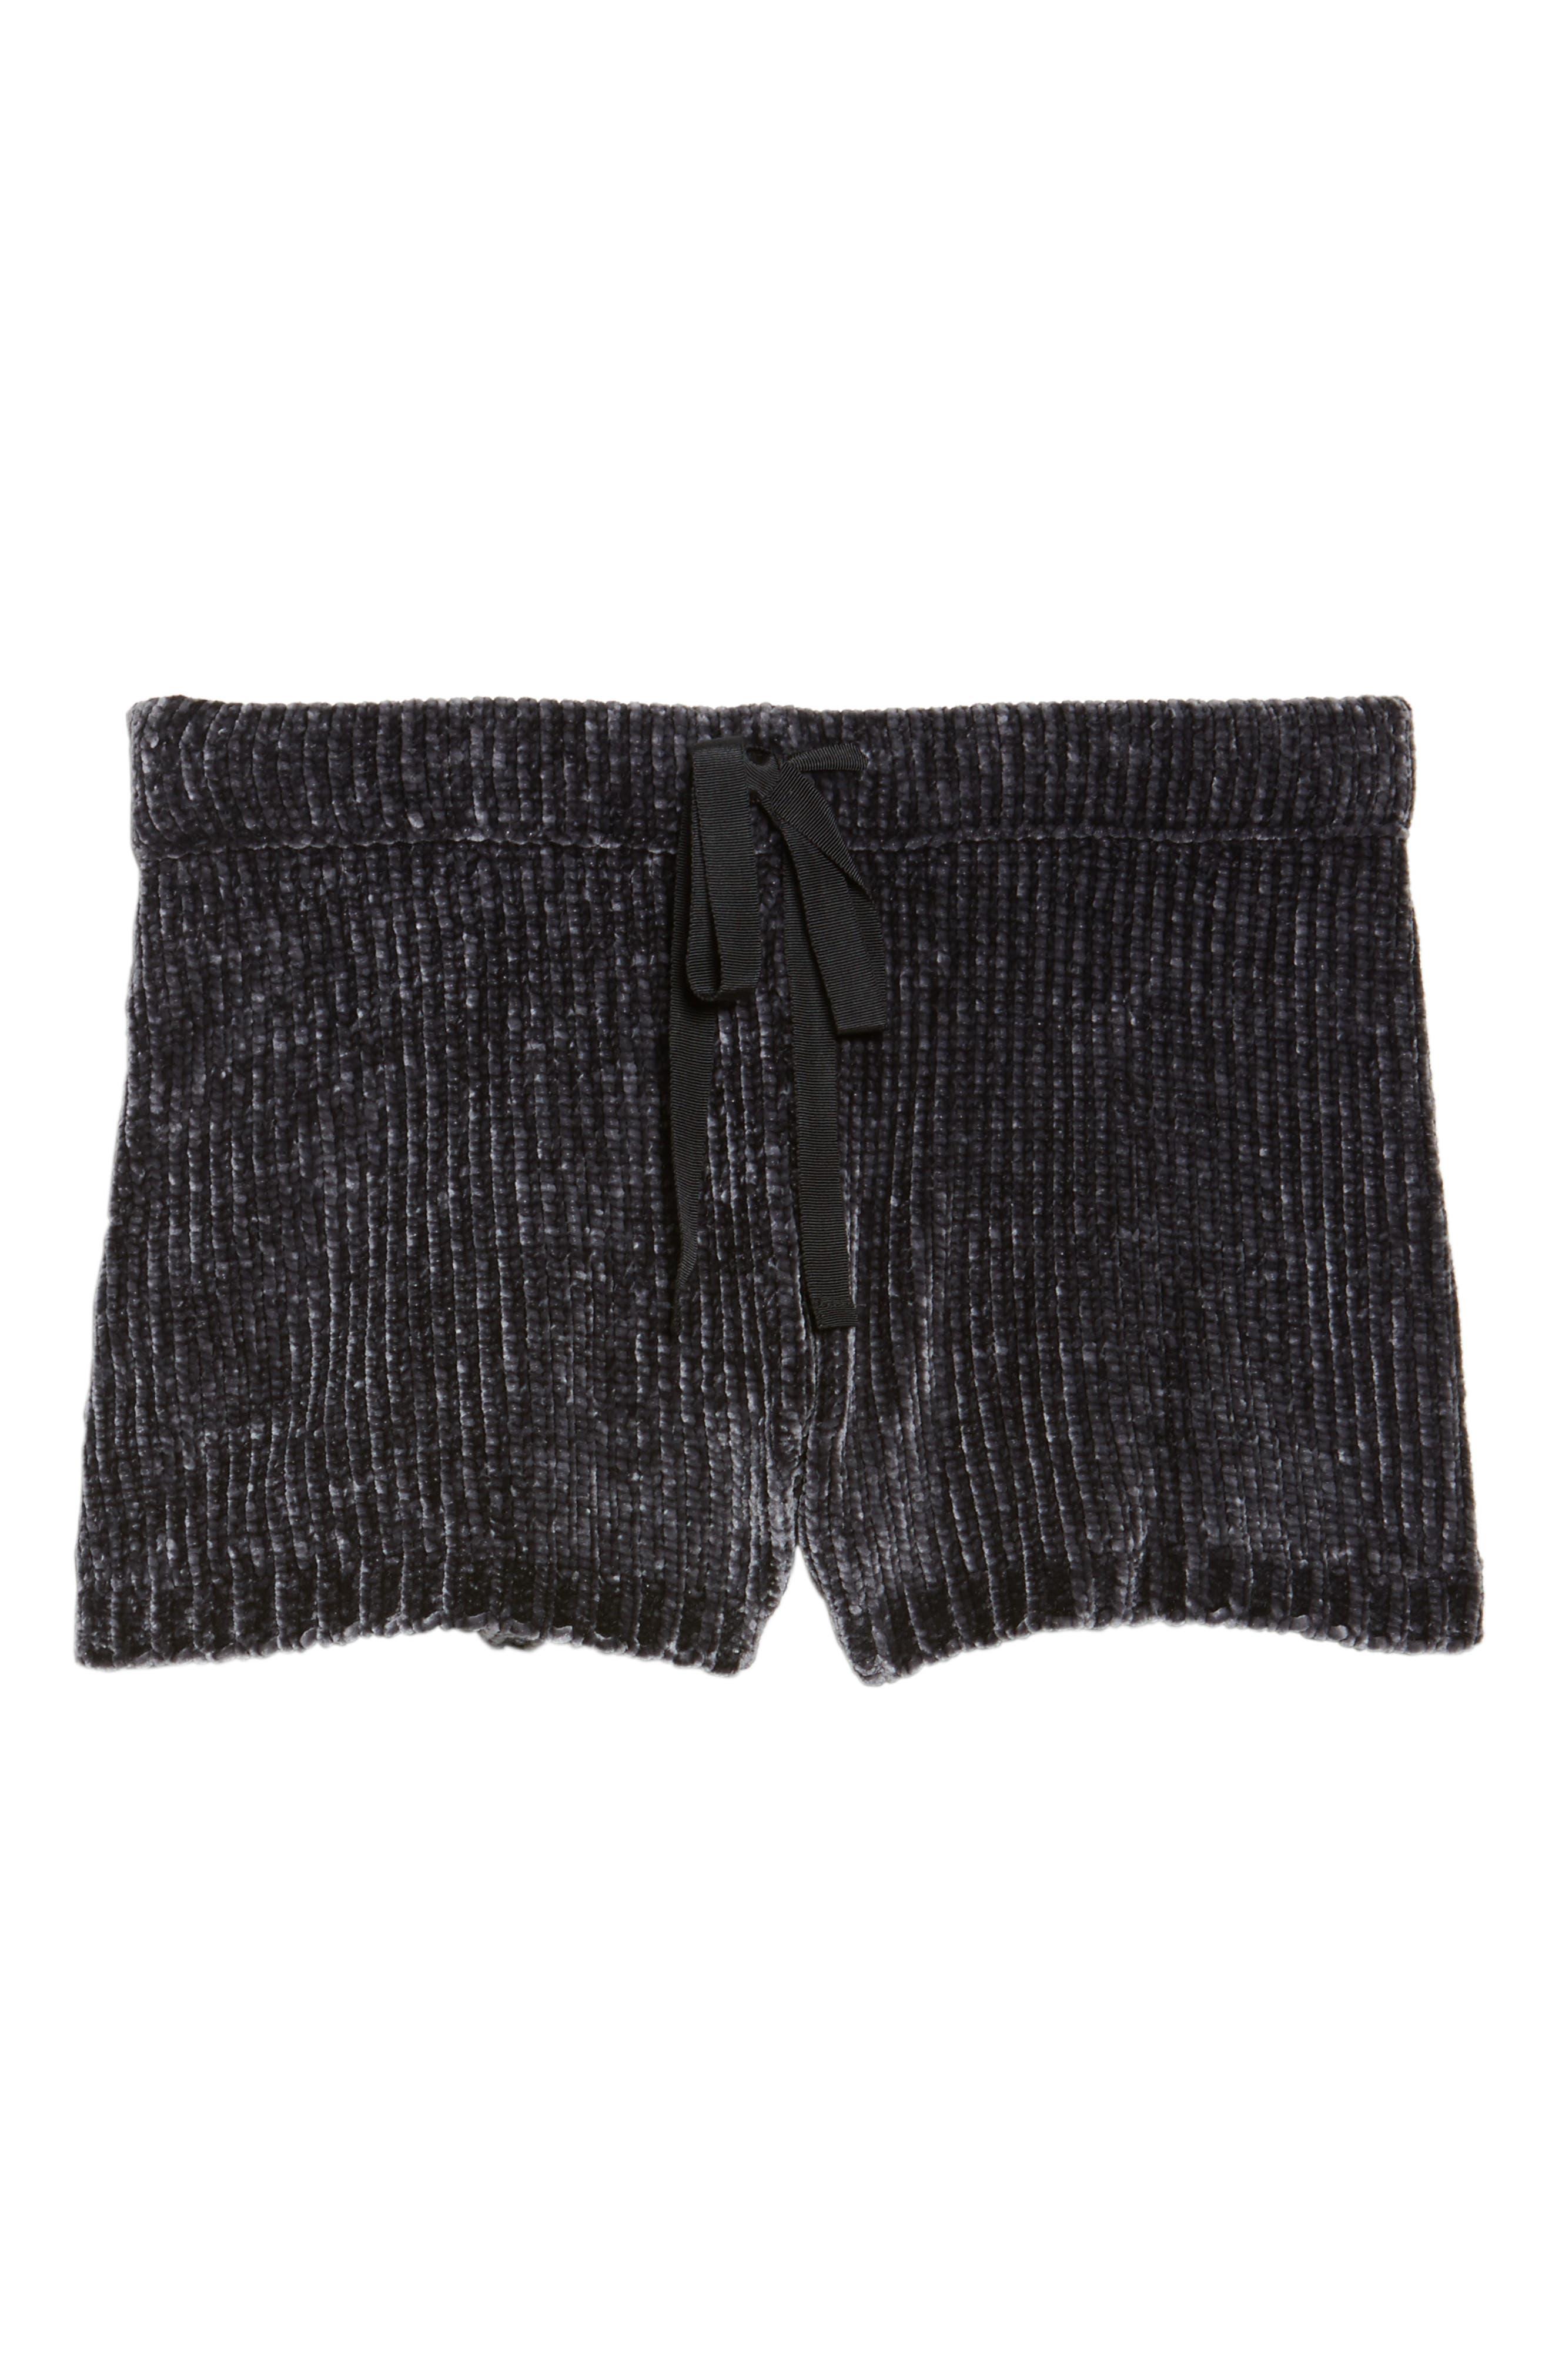 Chenille Shorts,                             Alternate thumbnail 11, color,